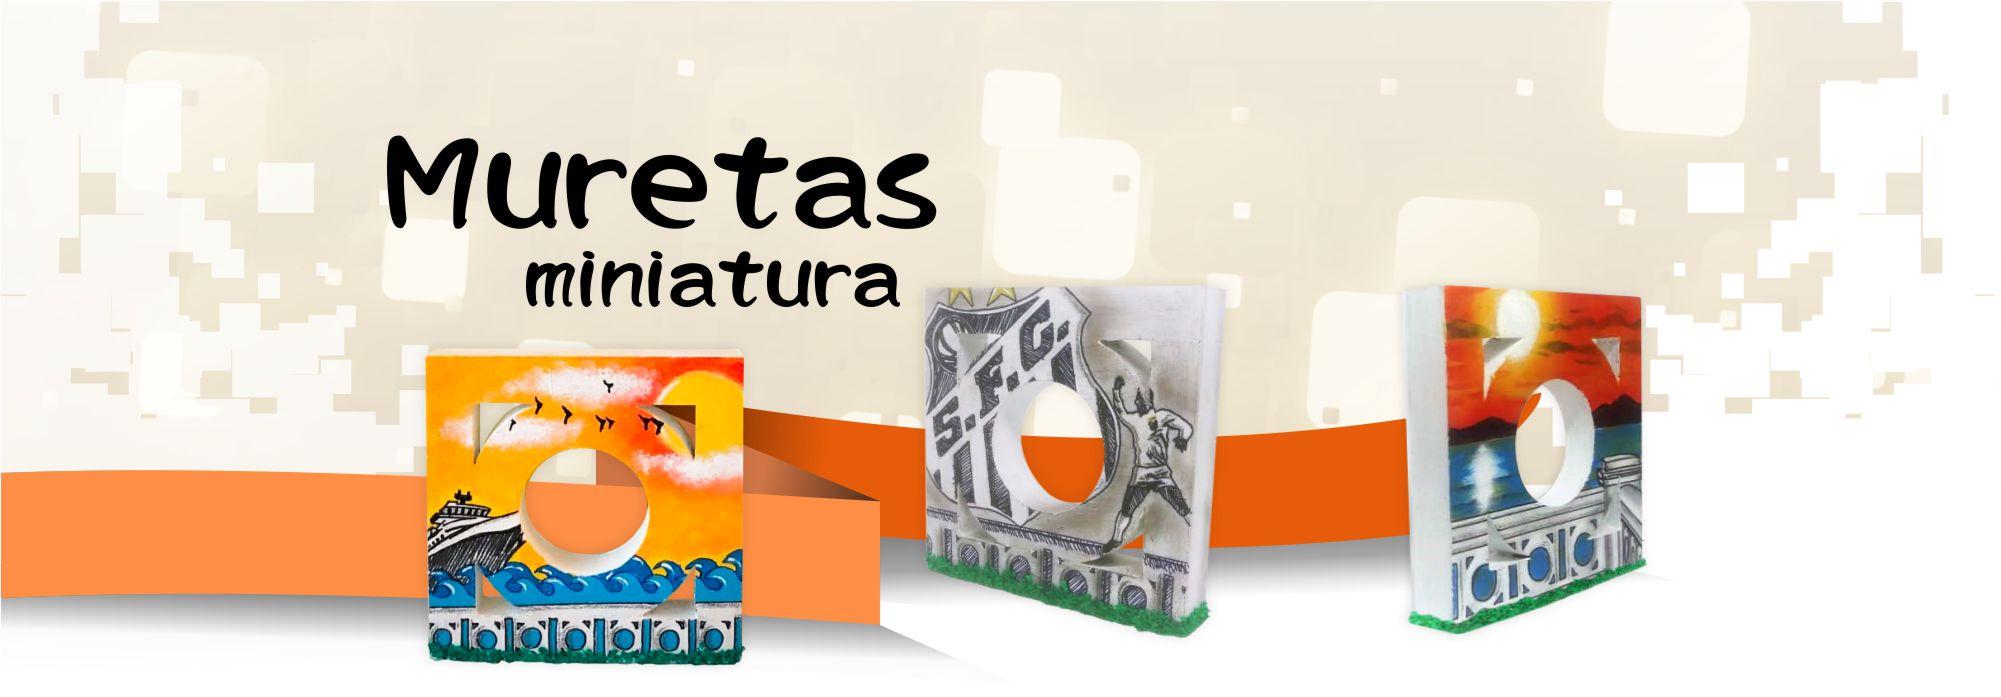 Muretas Miniatura de Santos